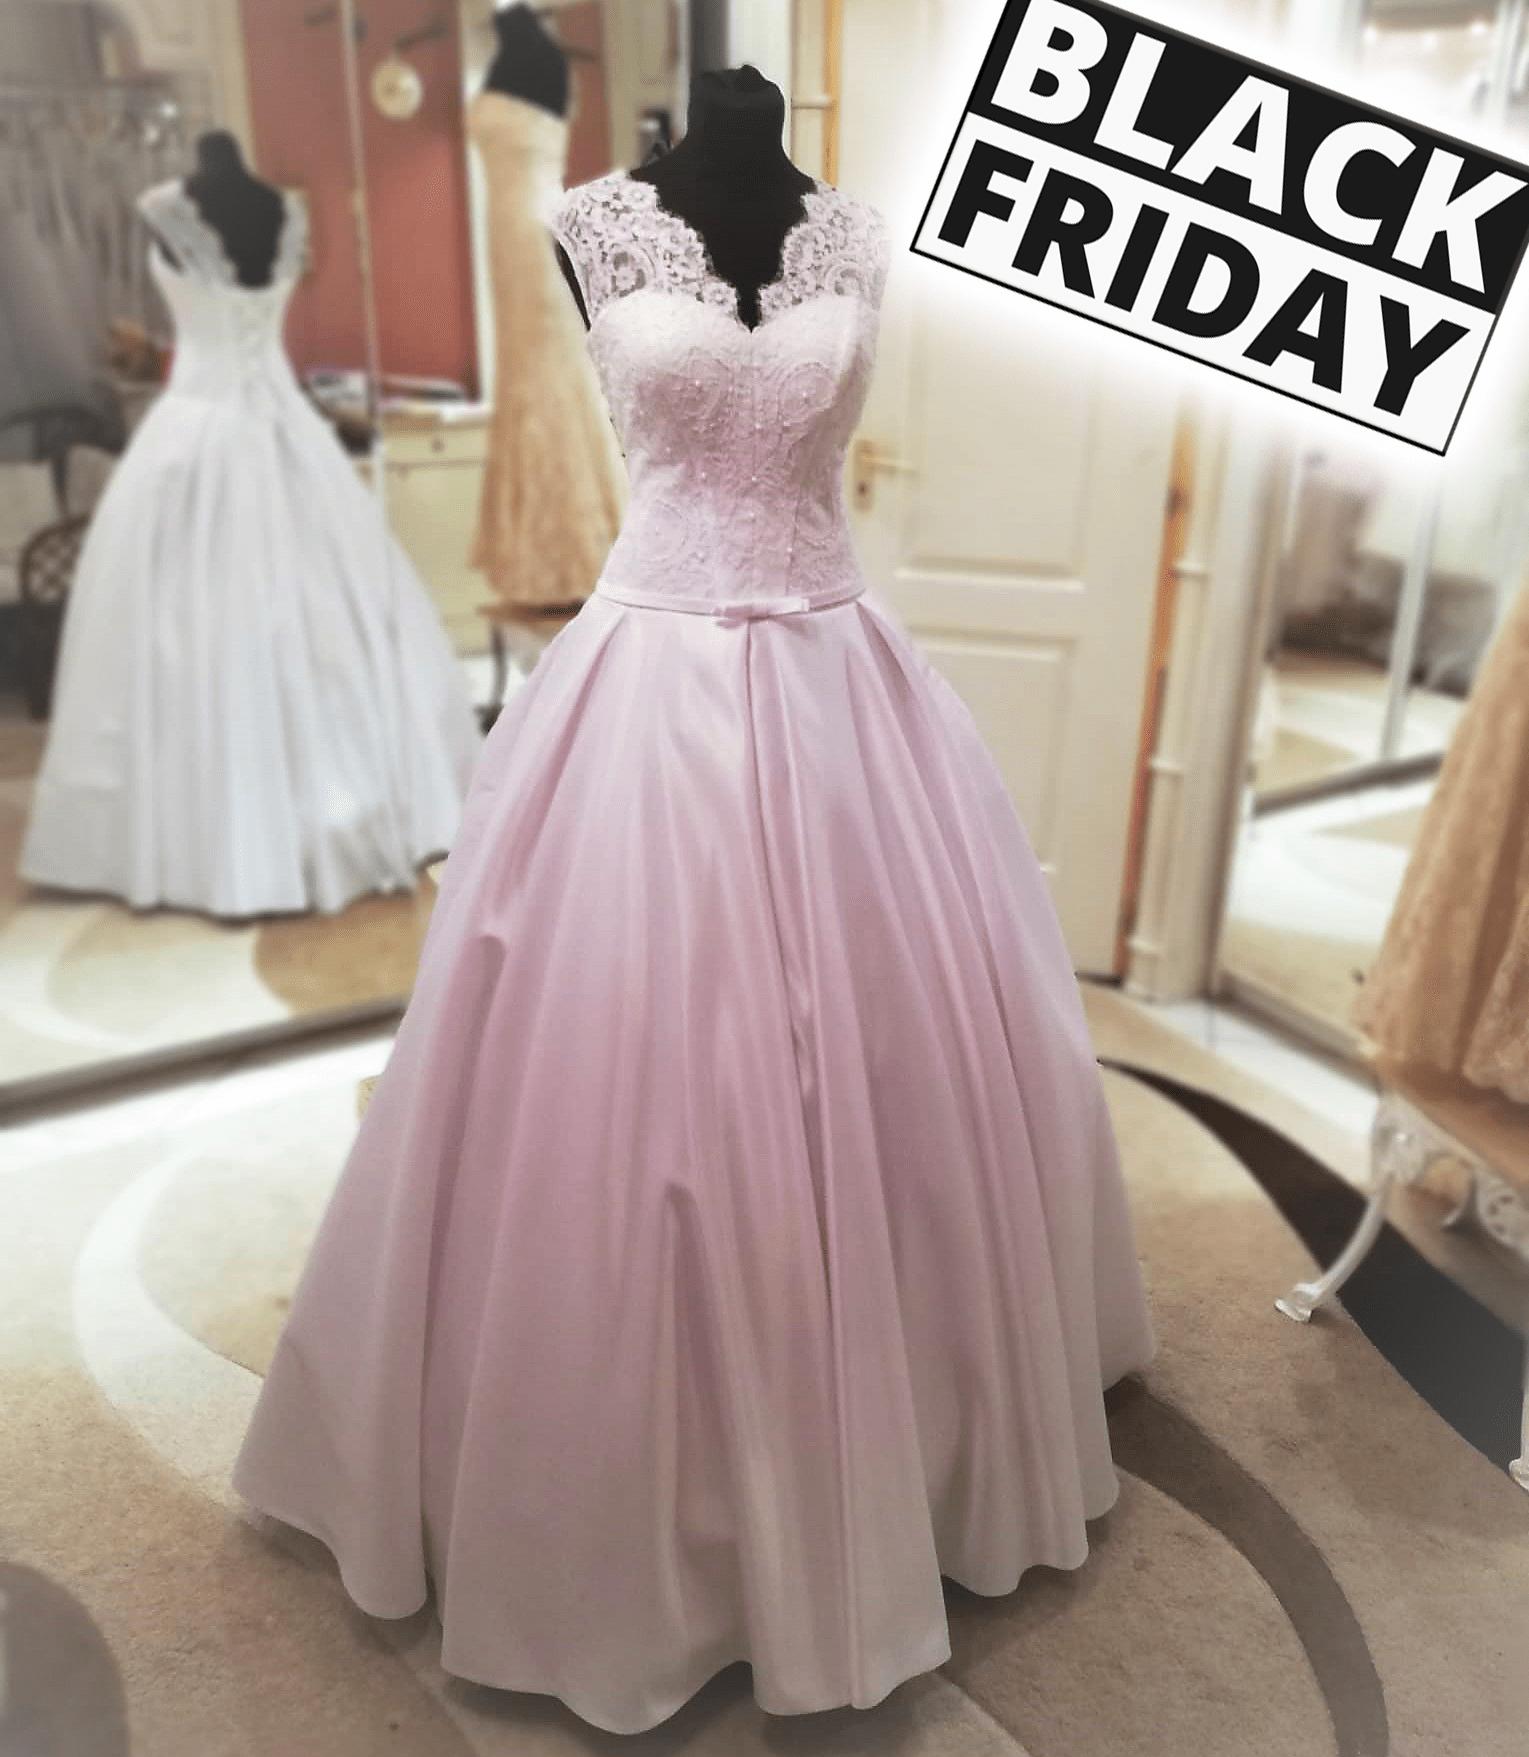 Black Friday Menyasszonyi Ruha